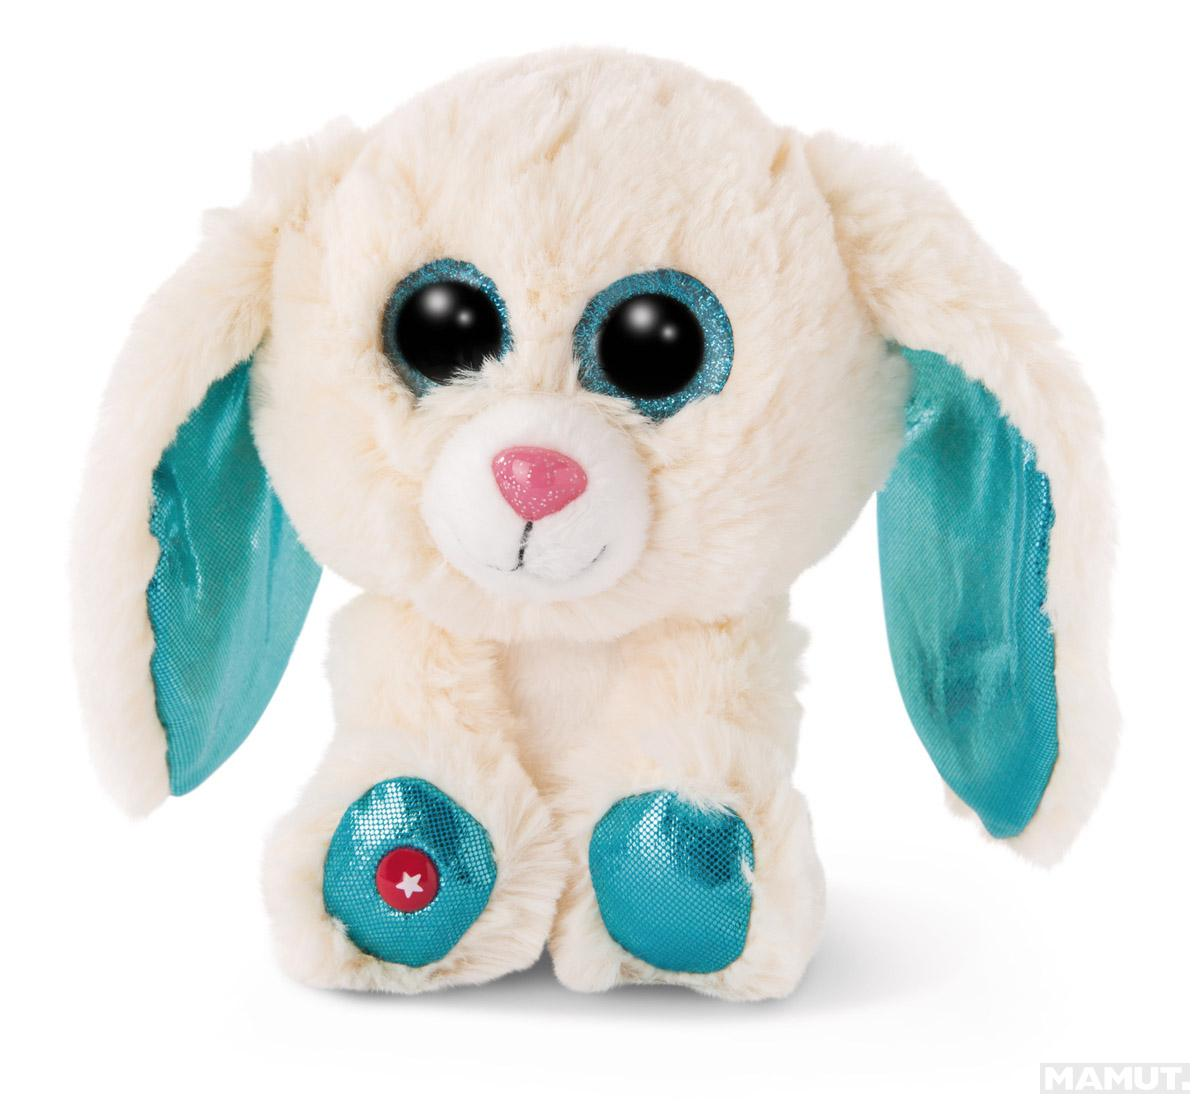 Plišana igračka GLUBSCHIS Bunny Wolli-Dot